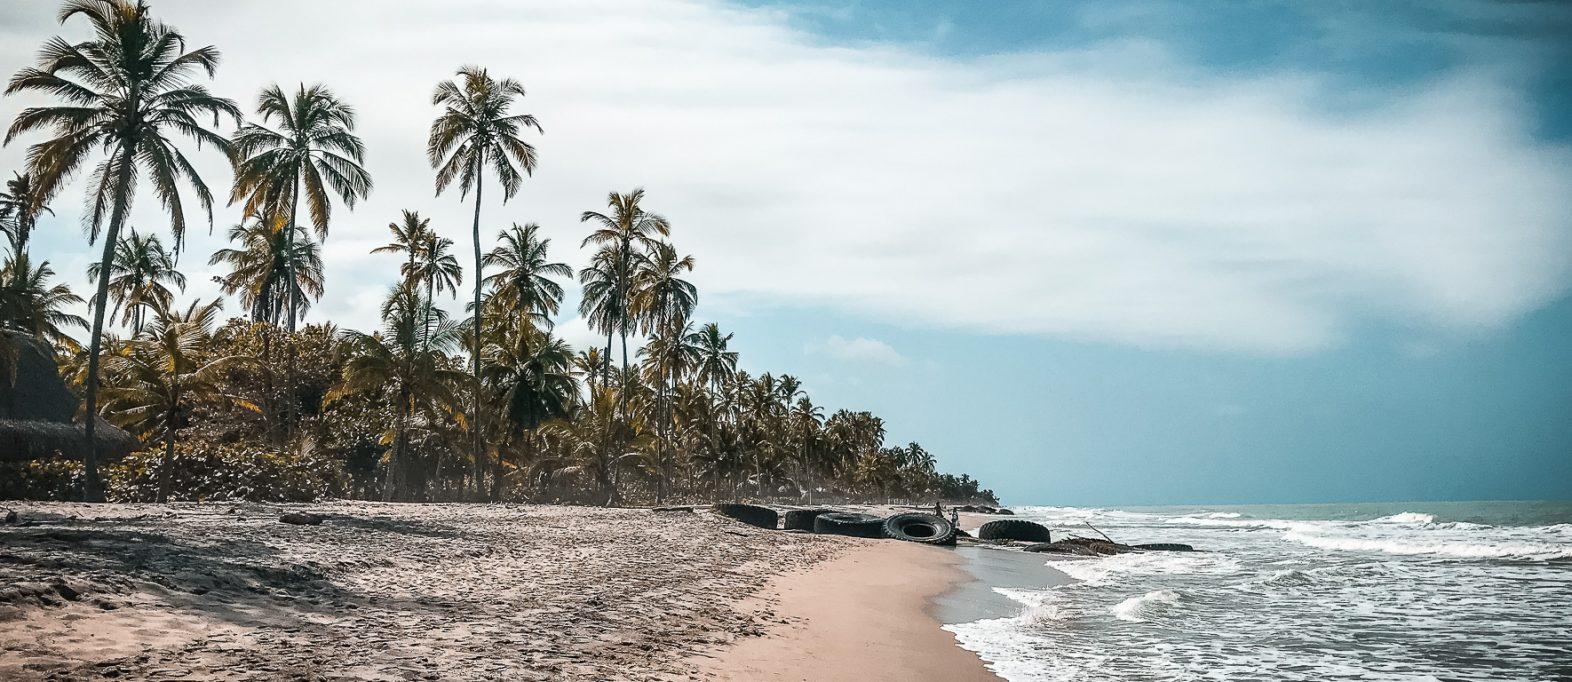 Palomino Kolumbien